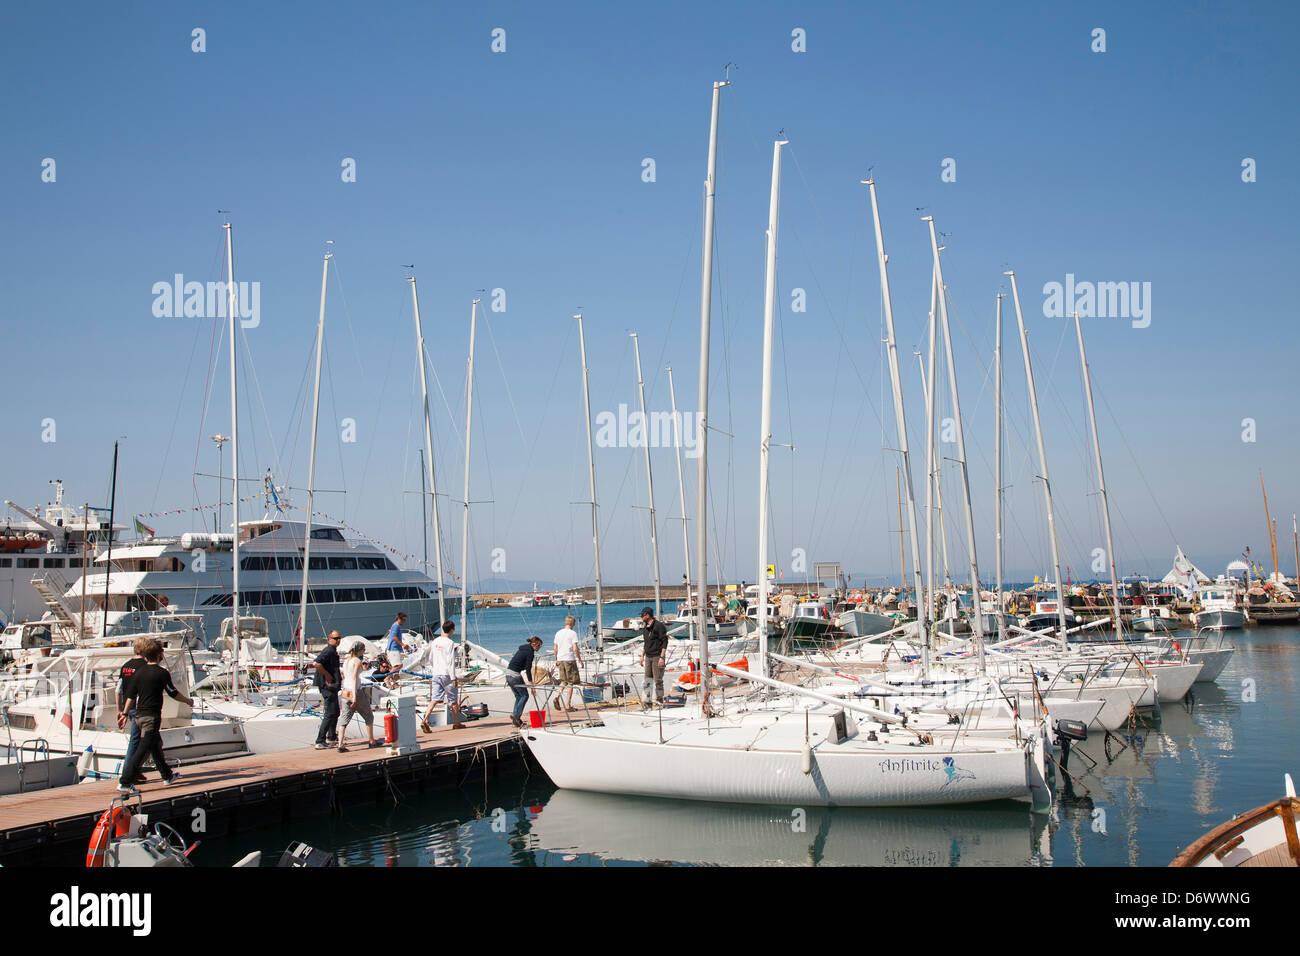 europe, italy, tuscany, argentario, porto santo stefano, port Stock Photo